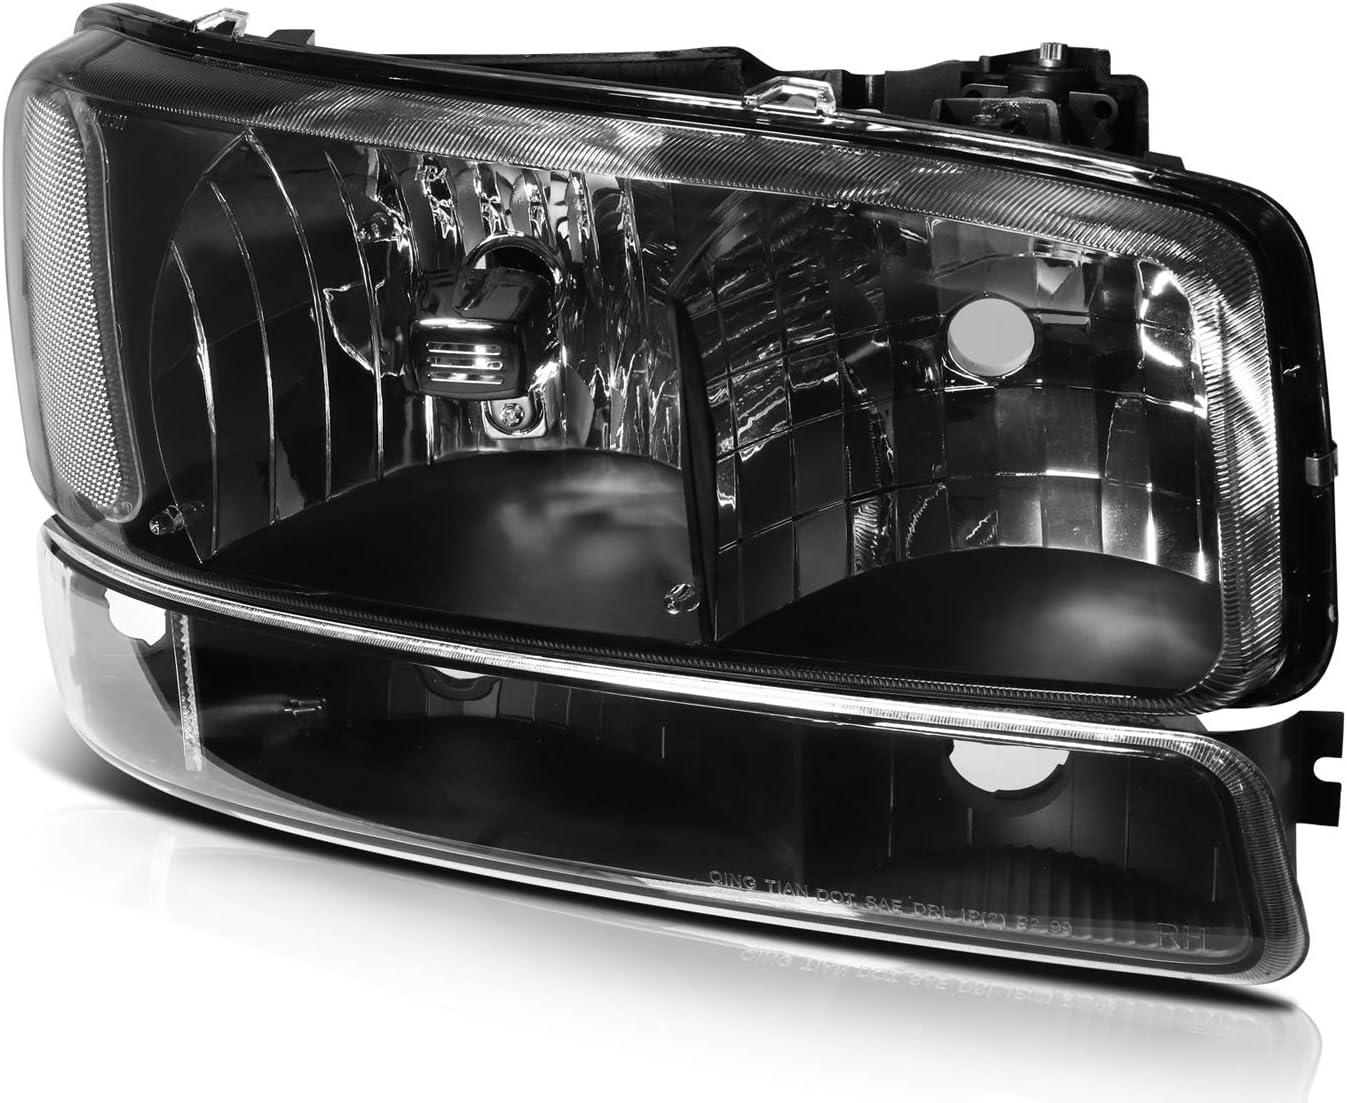 ECCPP Headlight Assembly Black Headlights+Bumper Light Lamp for GMC Sierra 1500 2500 3500,1500 HD 2500 HD,1500 HD//2500 HD//3500 Classic,for GMC Yukon,for GMC Yukon XL 1500 2500 1999-2007